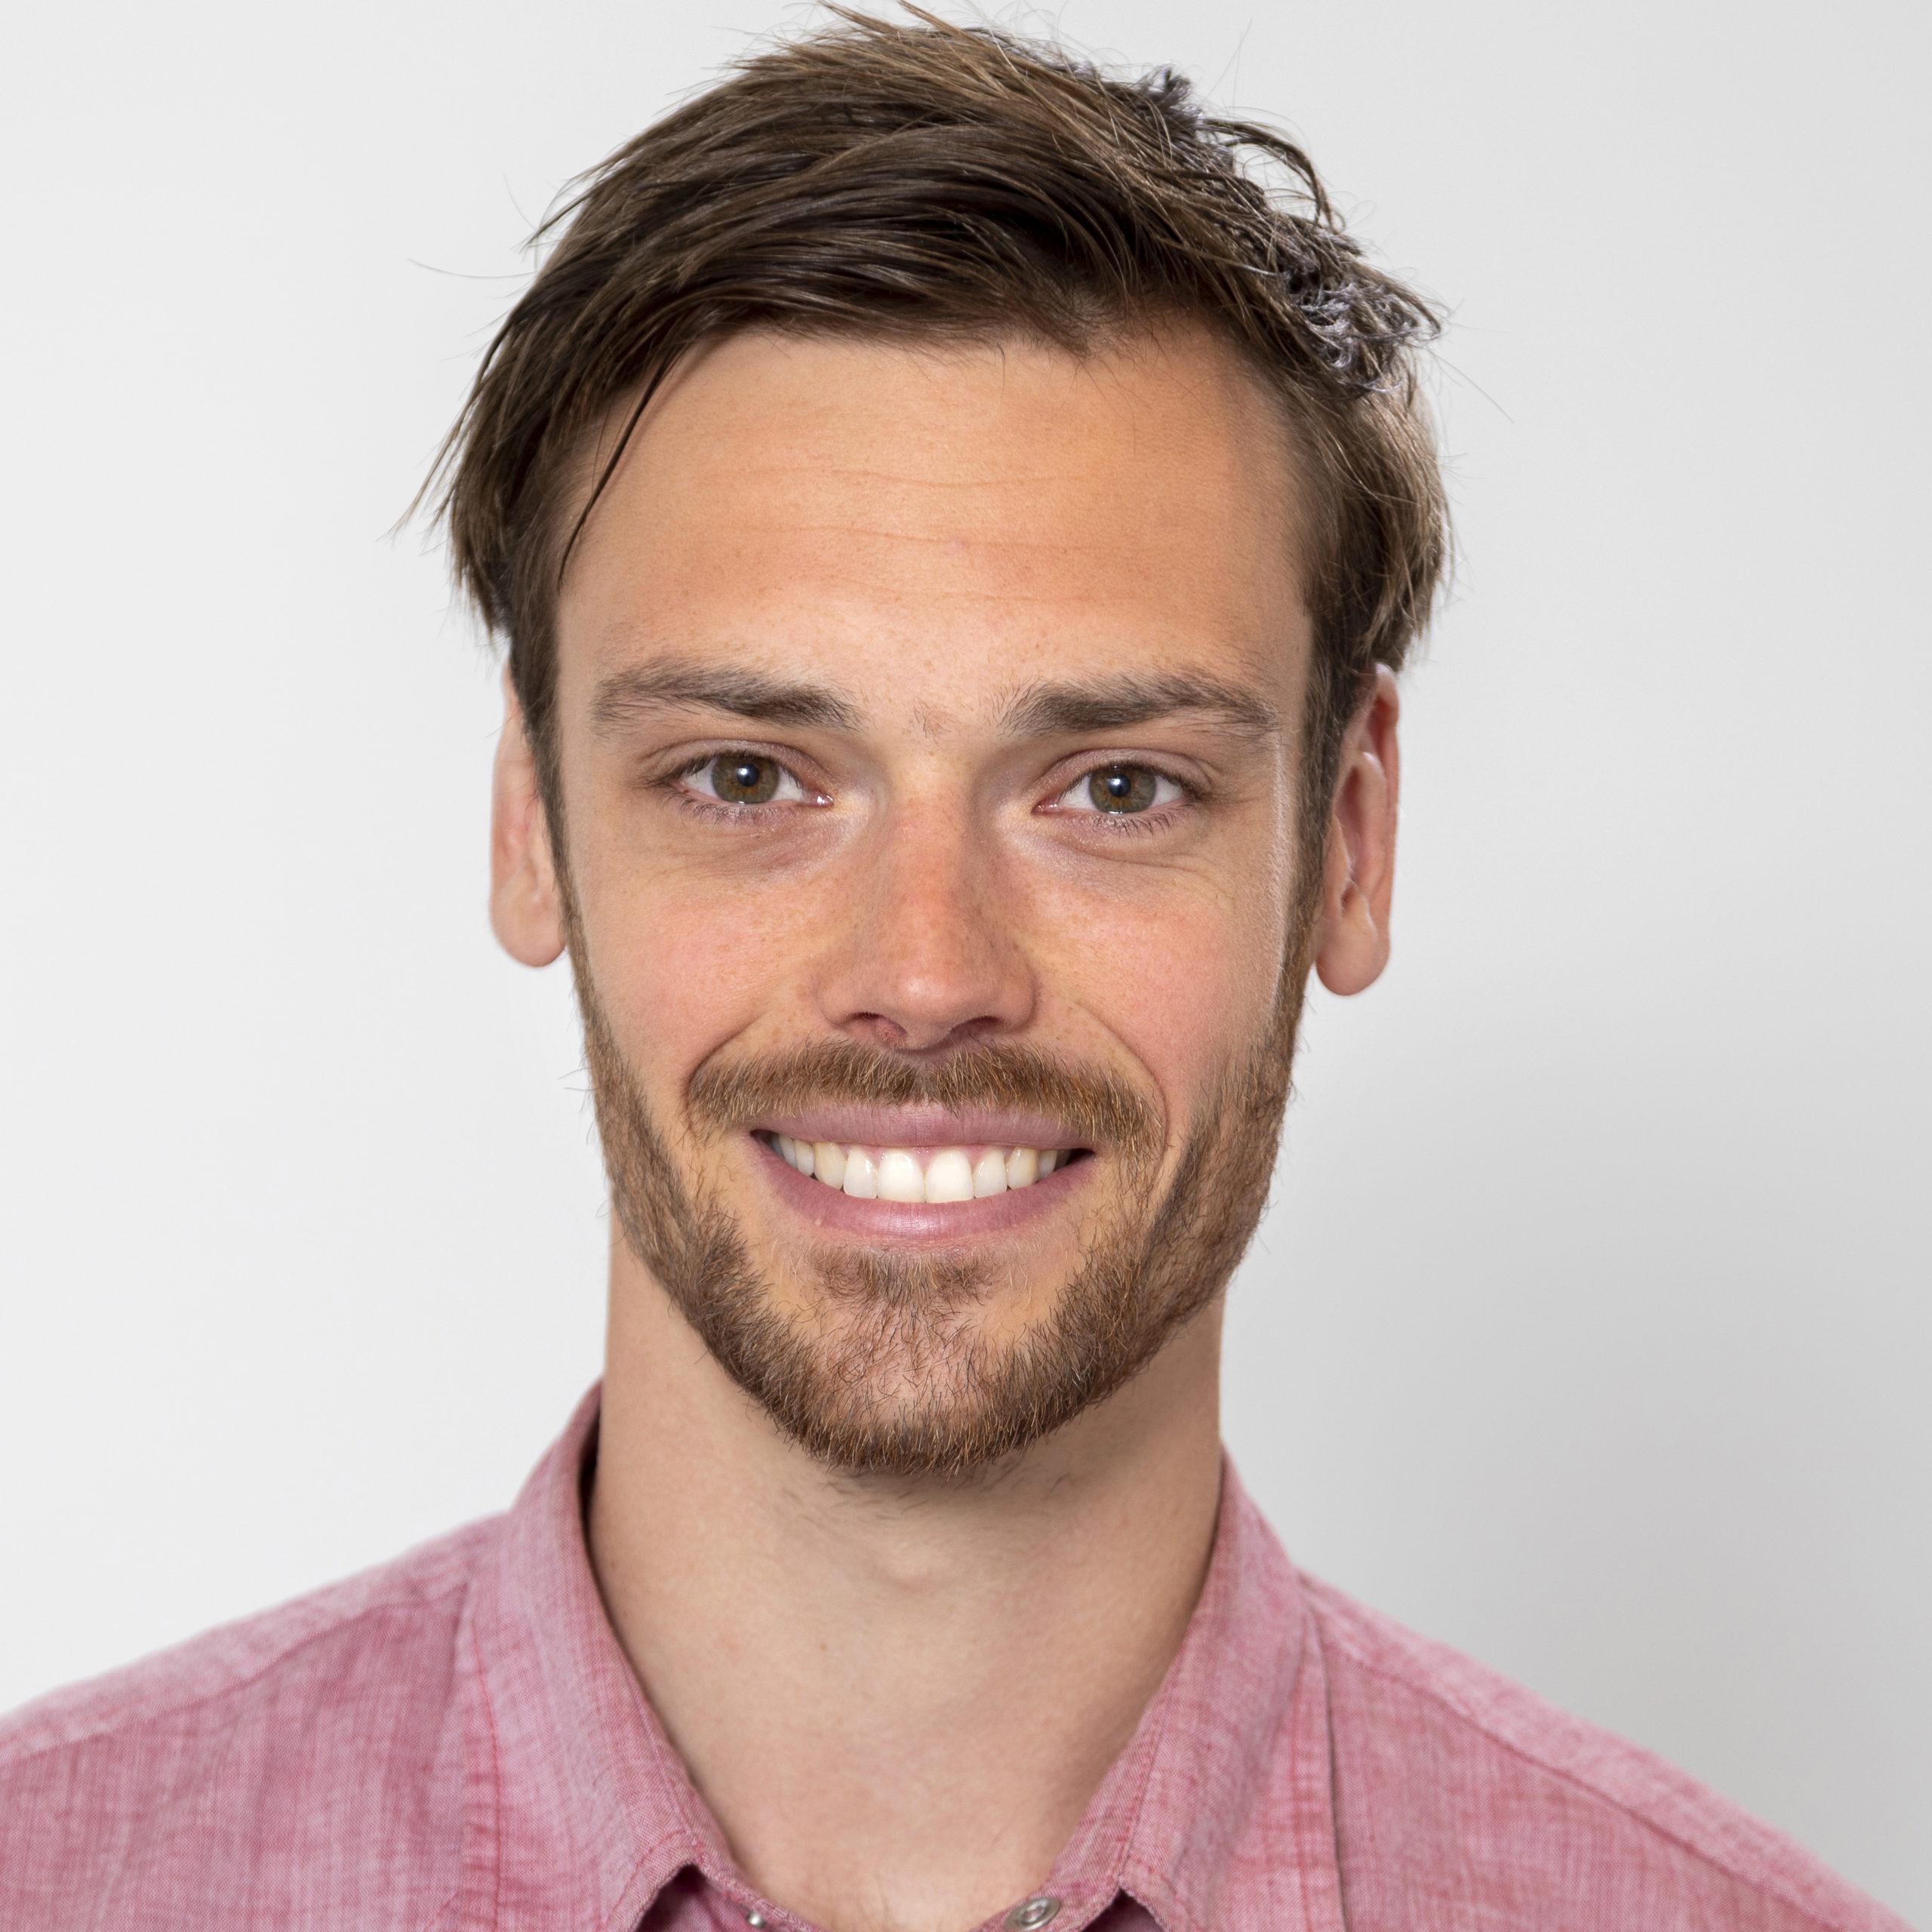 Daniel de Looze Prodeba zorgprofessional